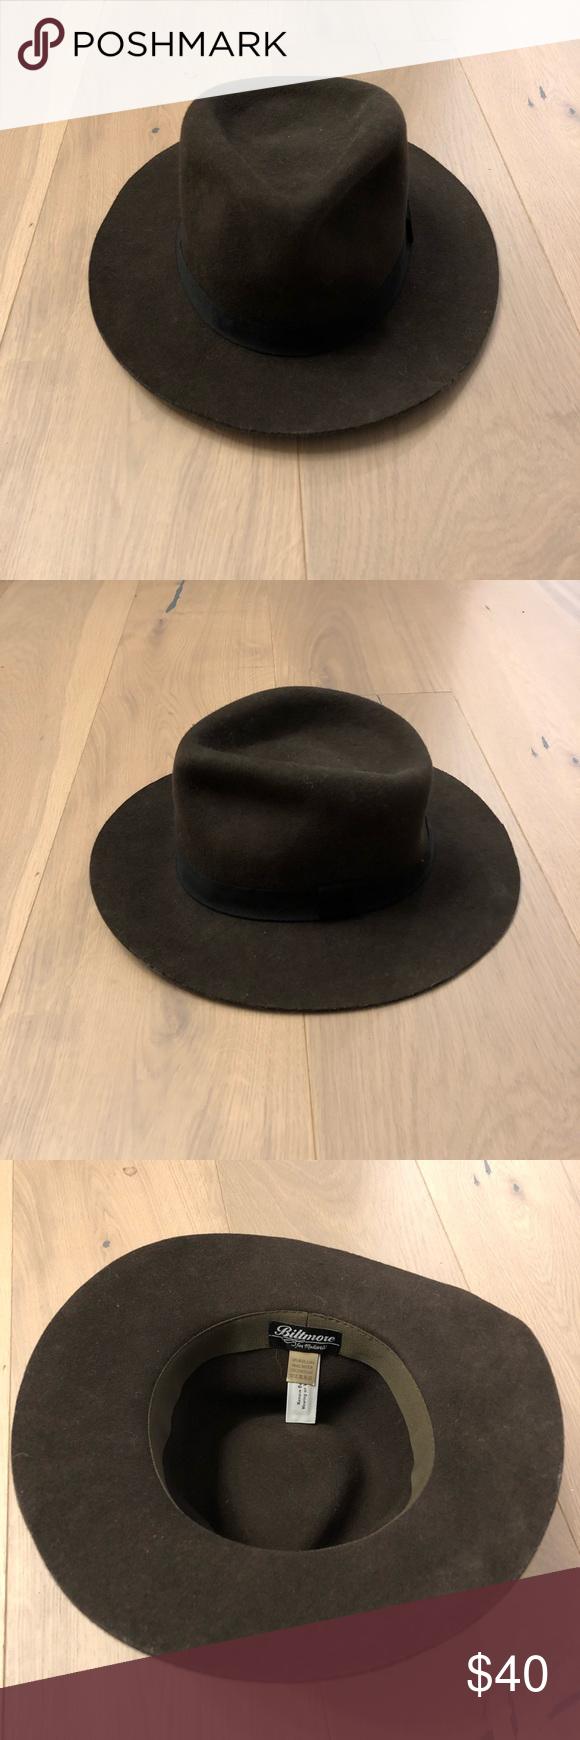 Madewell-Biltmore fedora hat size s-m 100% wool Madewell Accessories Hats c4d4edd3fc5d